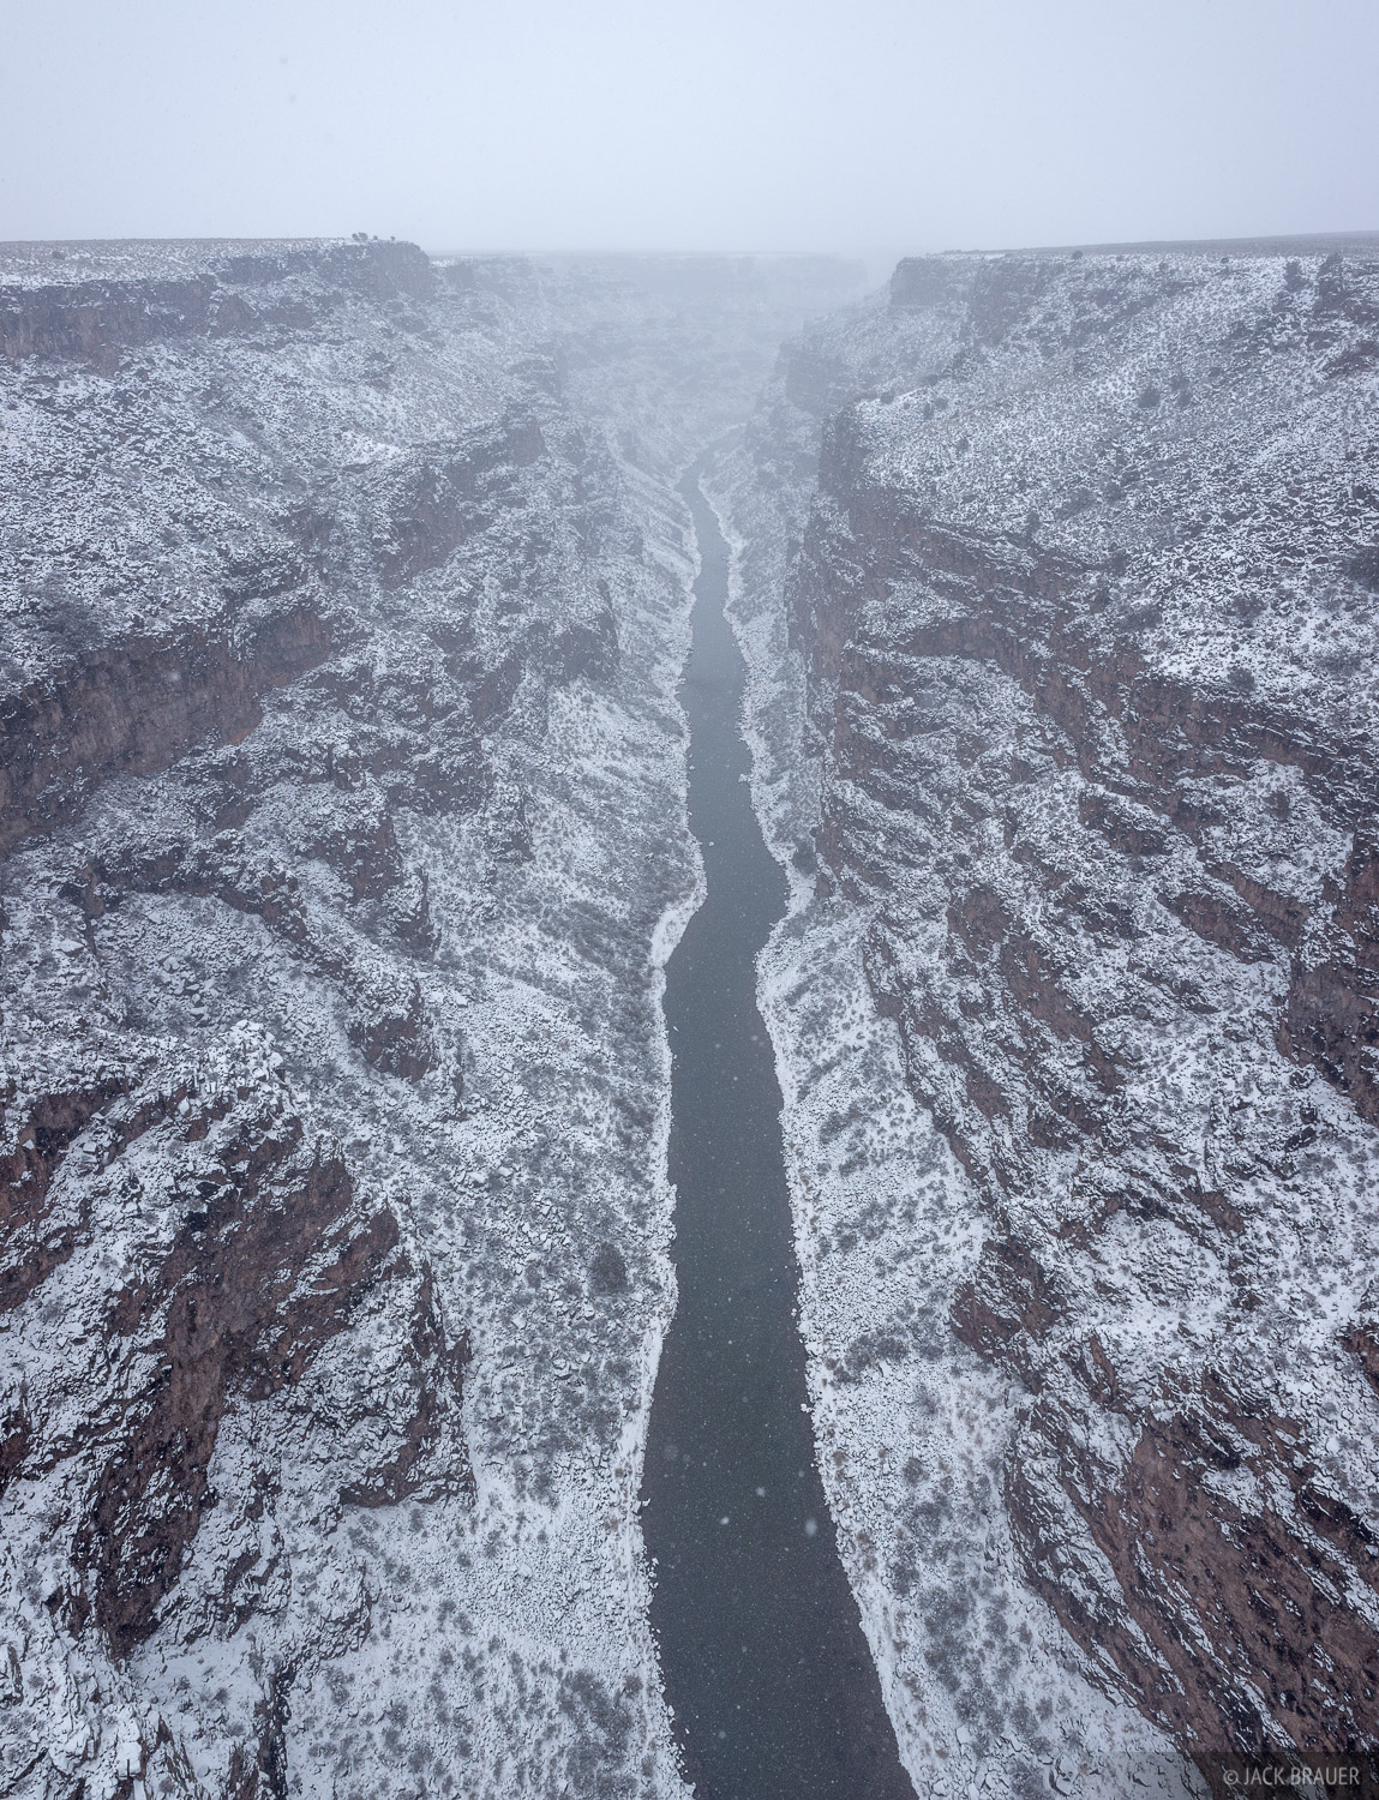 New Mexico,Rio Grande,Taos,Rio Grande Gorge, snow, photo